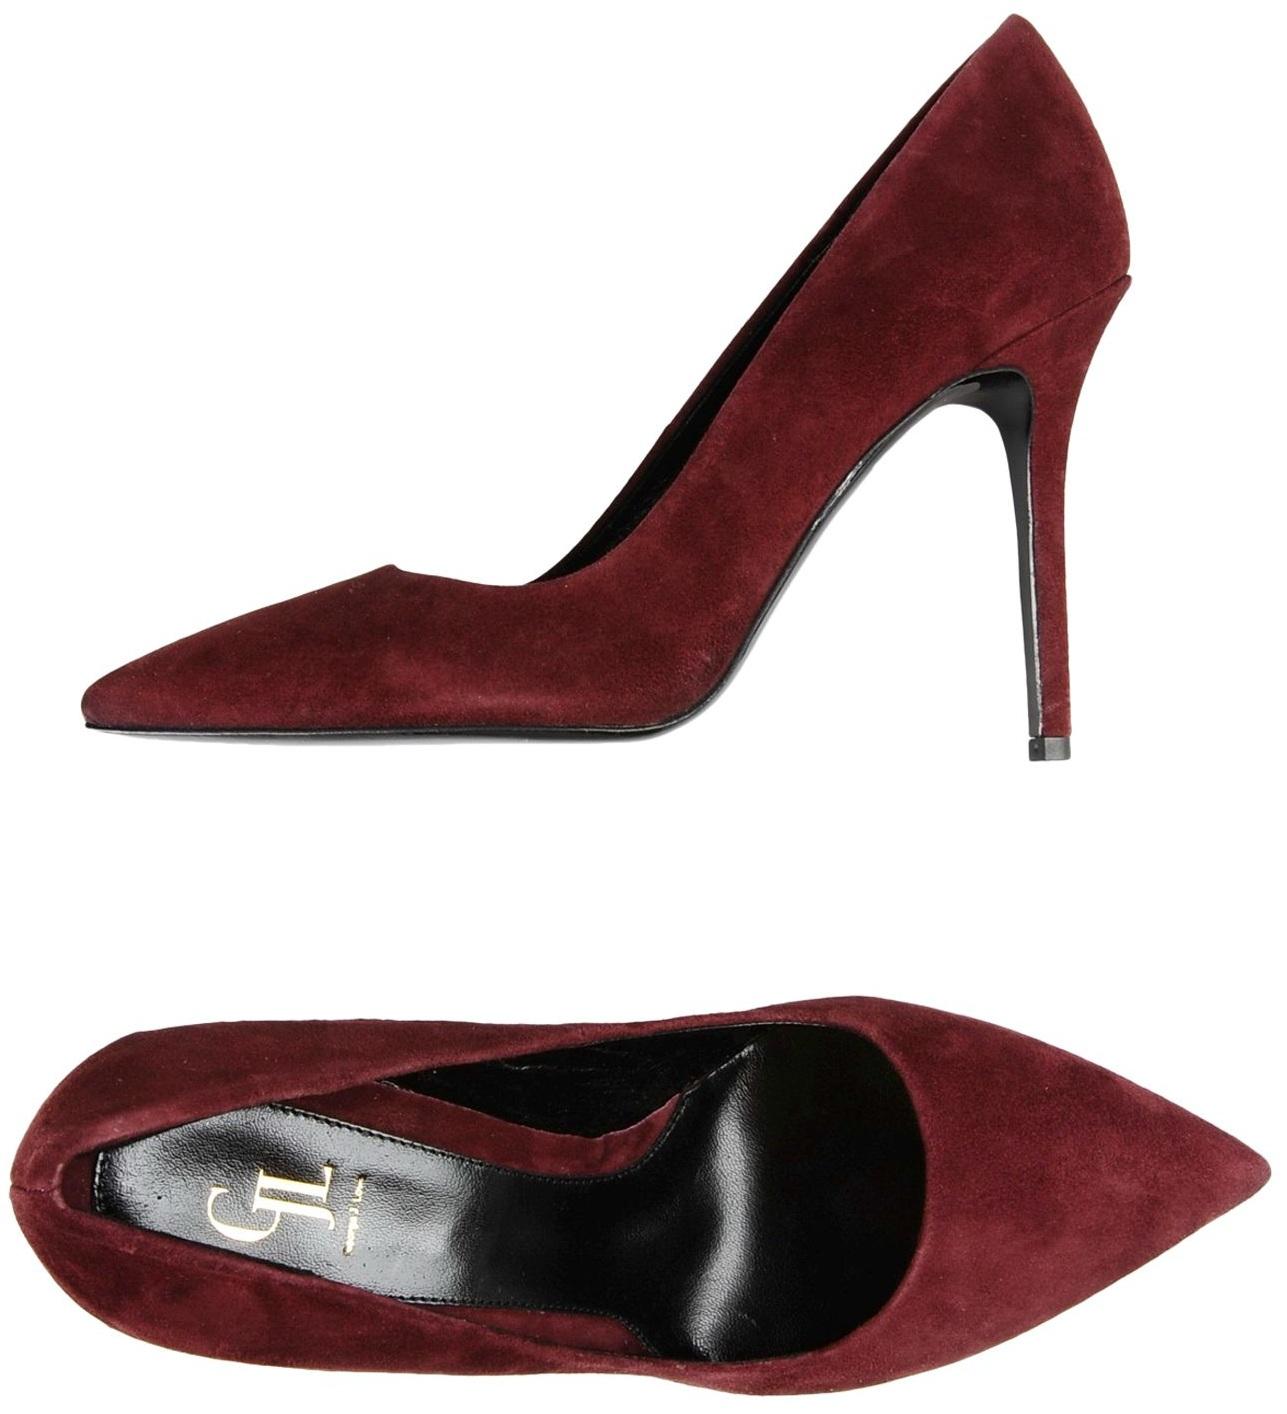 Туфли George J. Love 1 10 красных лодочек для Дня святого Валентина